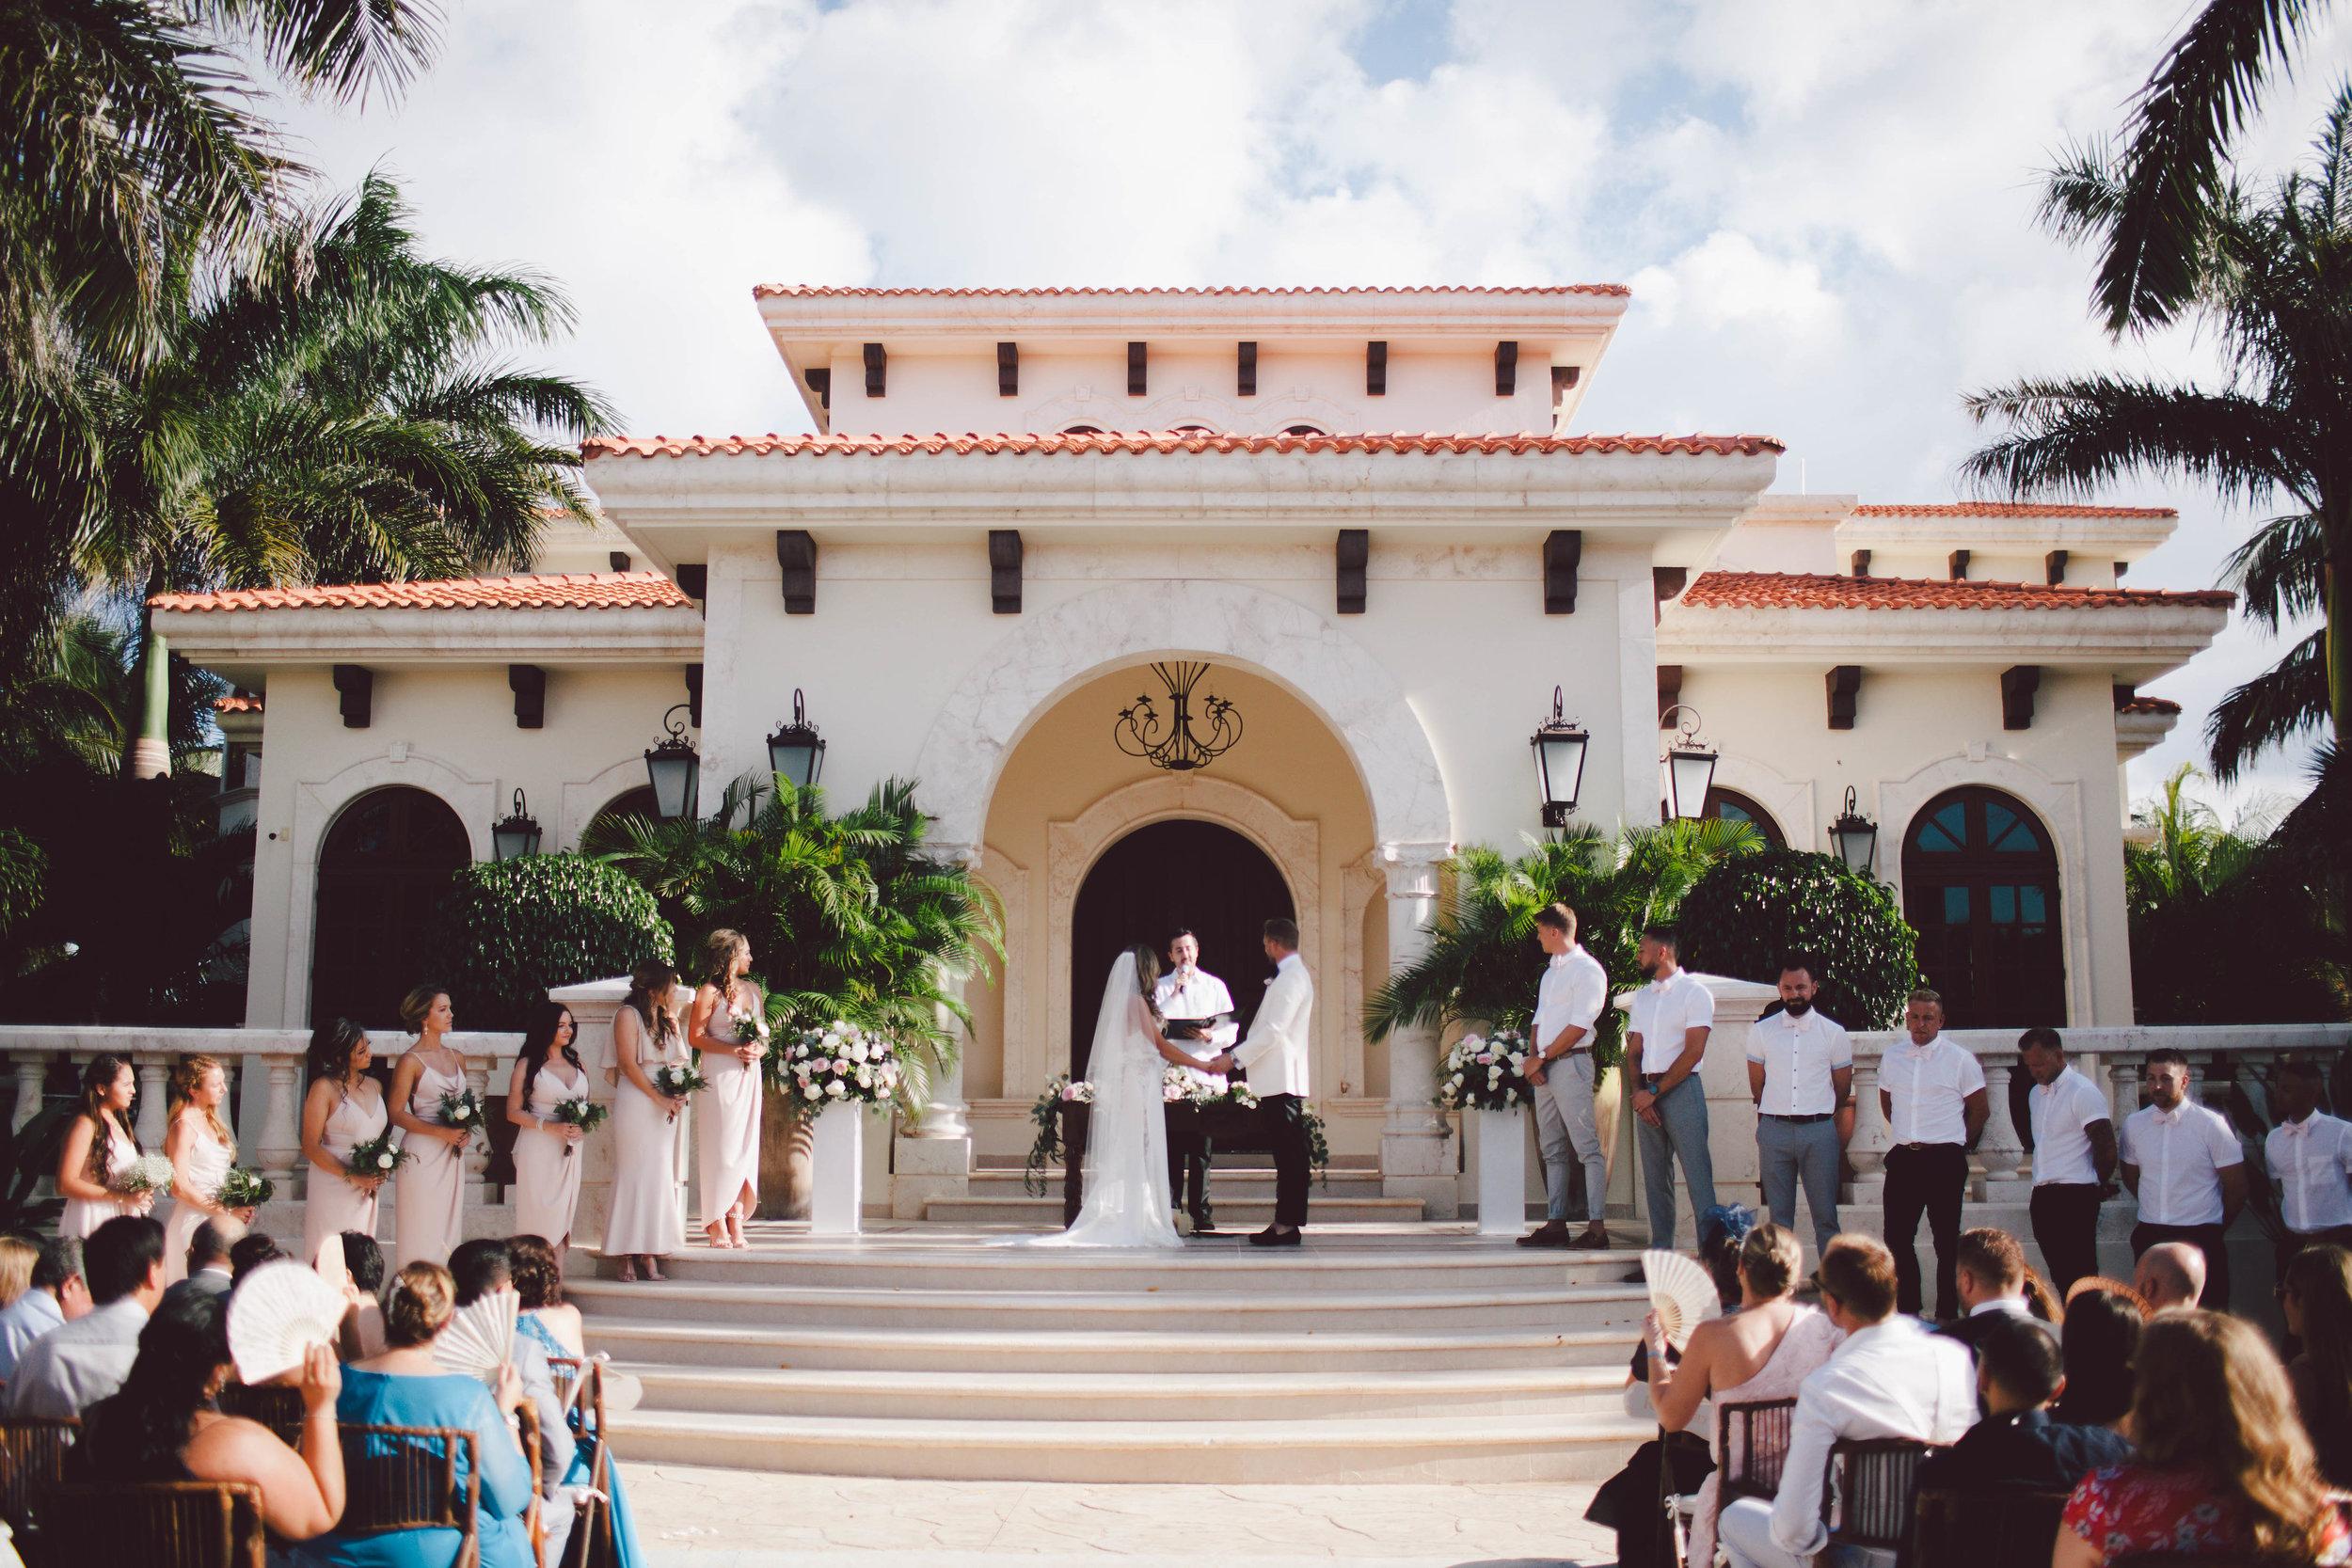 mexico_wedding_cancun_villa_la_joya_evangeline_lane_054.jpg